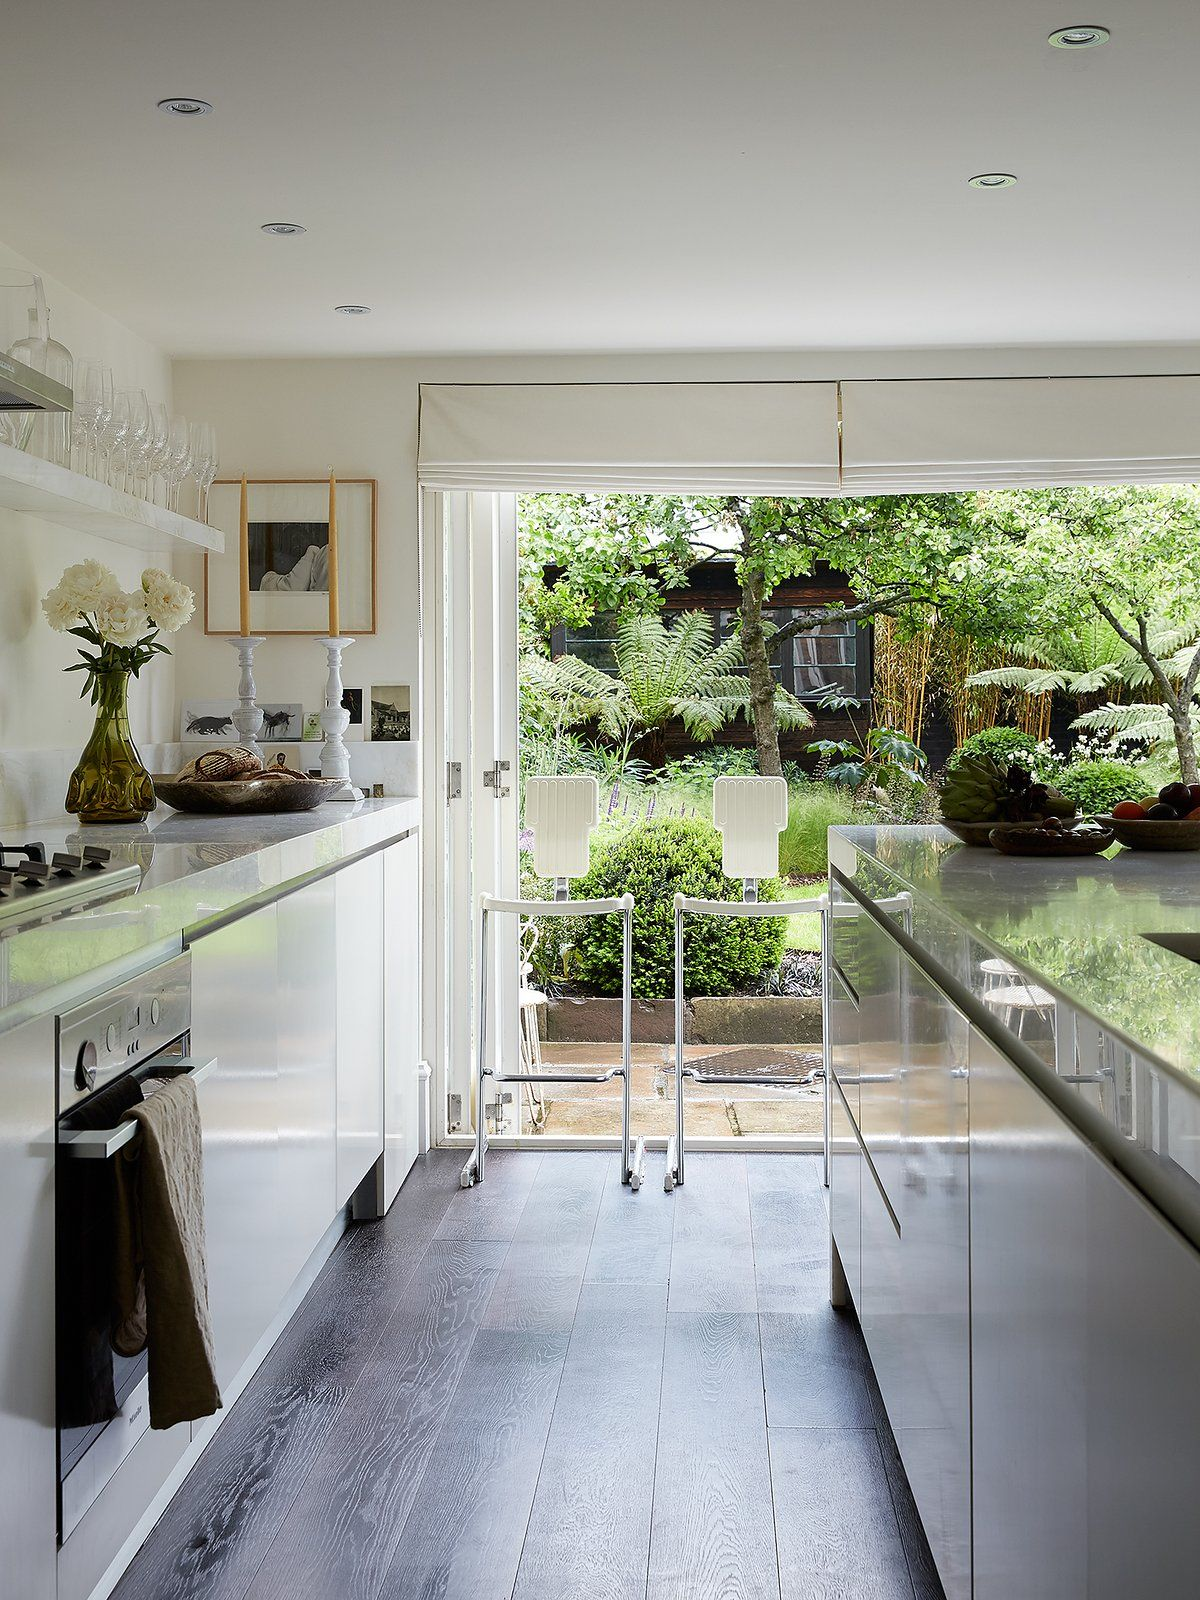 Balcony Design London: Simone Rocha's London Home